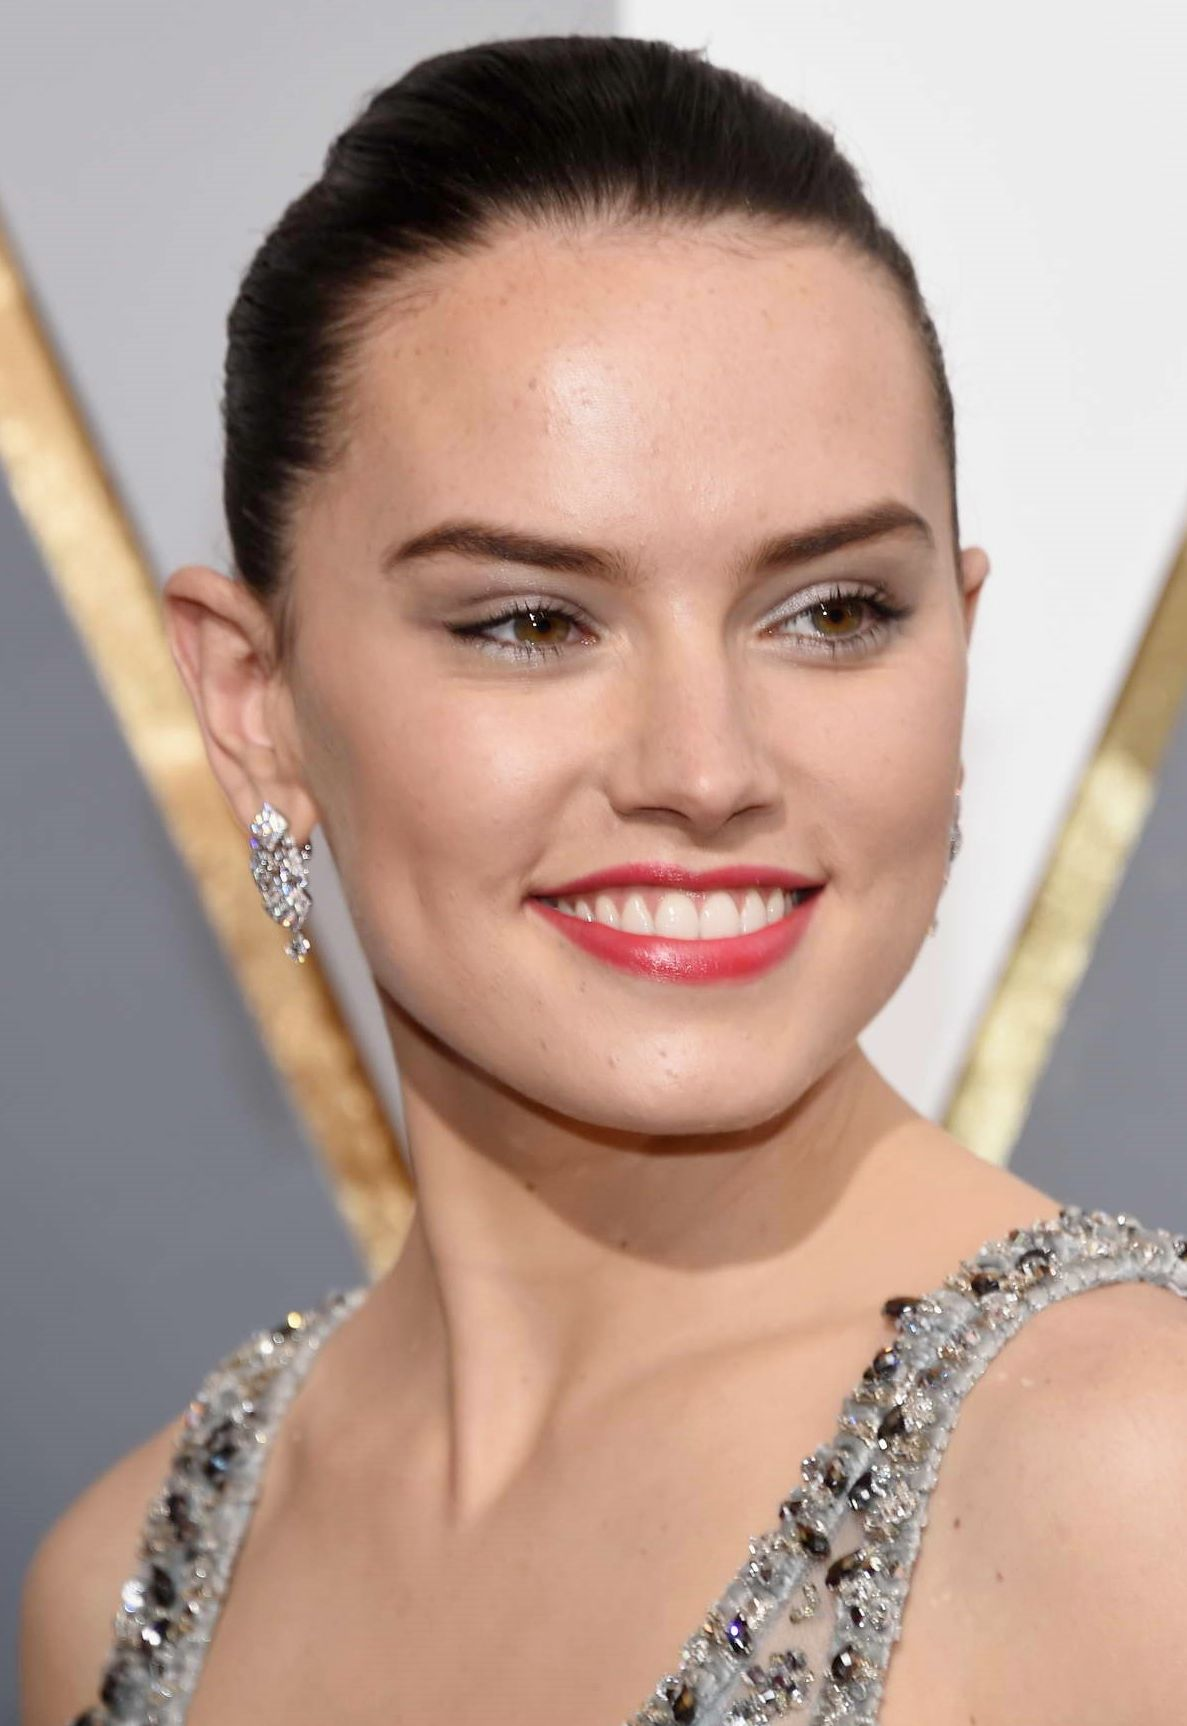 Daisy Ridley In Chanel At The Oscars 2016 Daisy Ridley Beauty Daisy